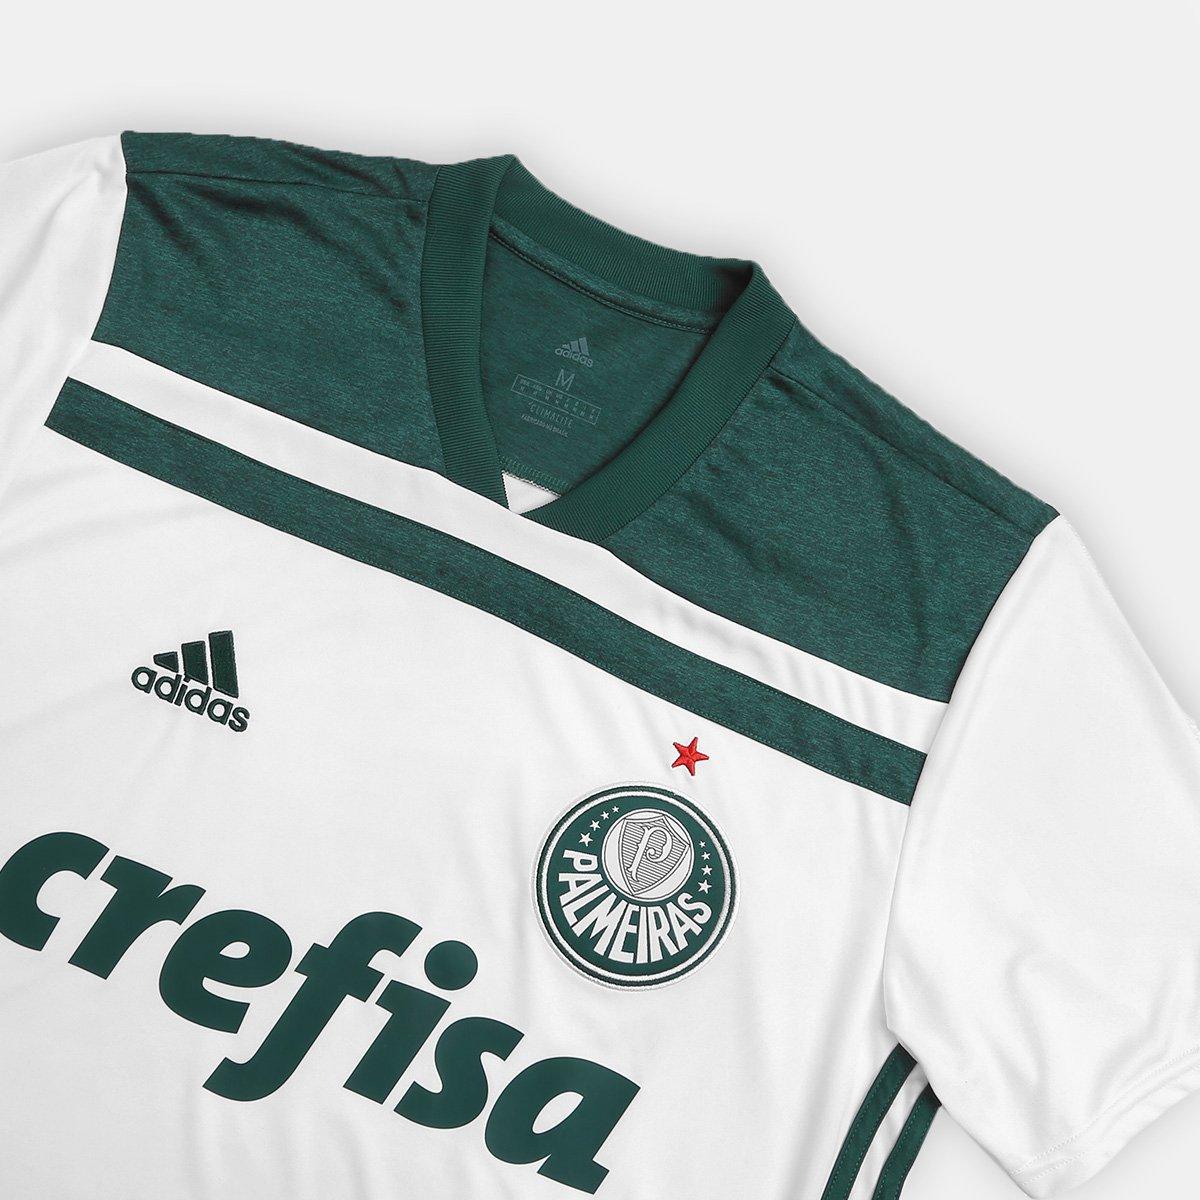 Camisa Palmeiras II 2018 s n° Torcedor Adidas Masculina - Branco e ... 82da9c1d0441e